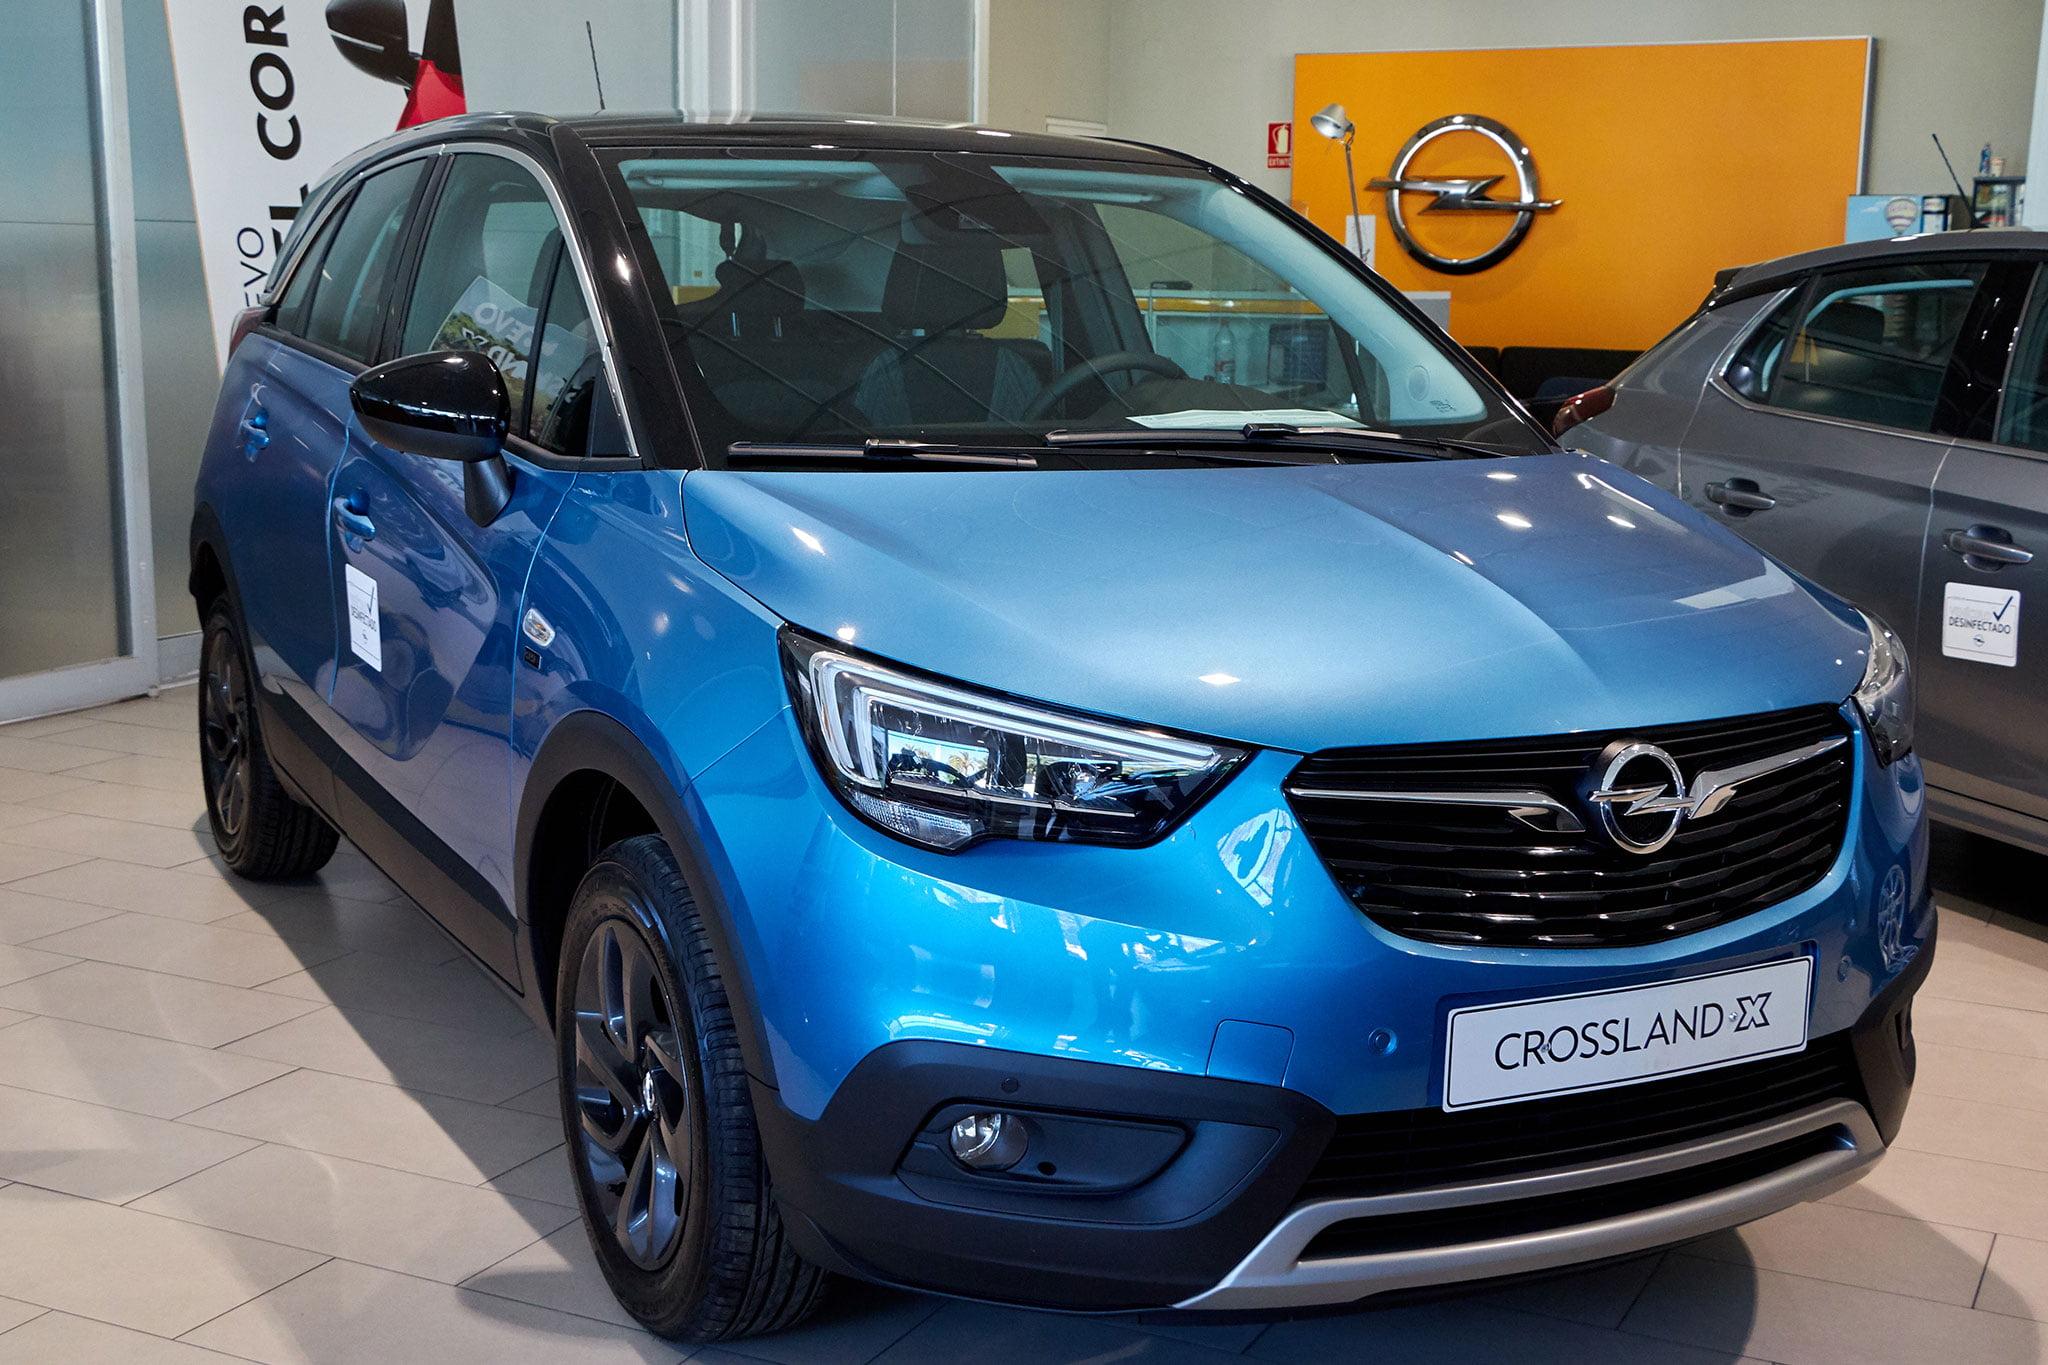 Crossland X azul – Auto Dénia Motors